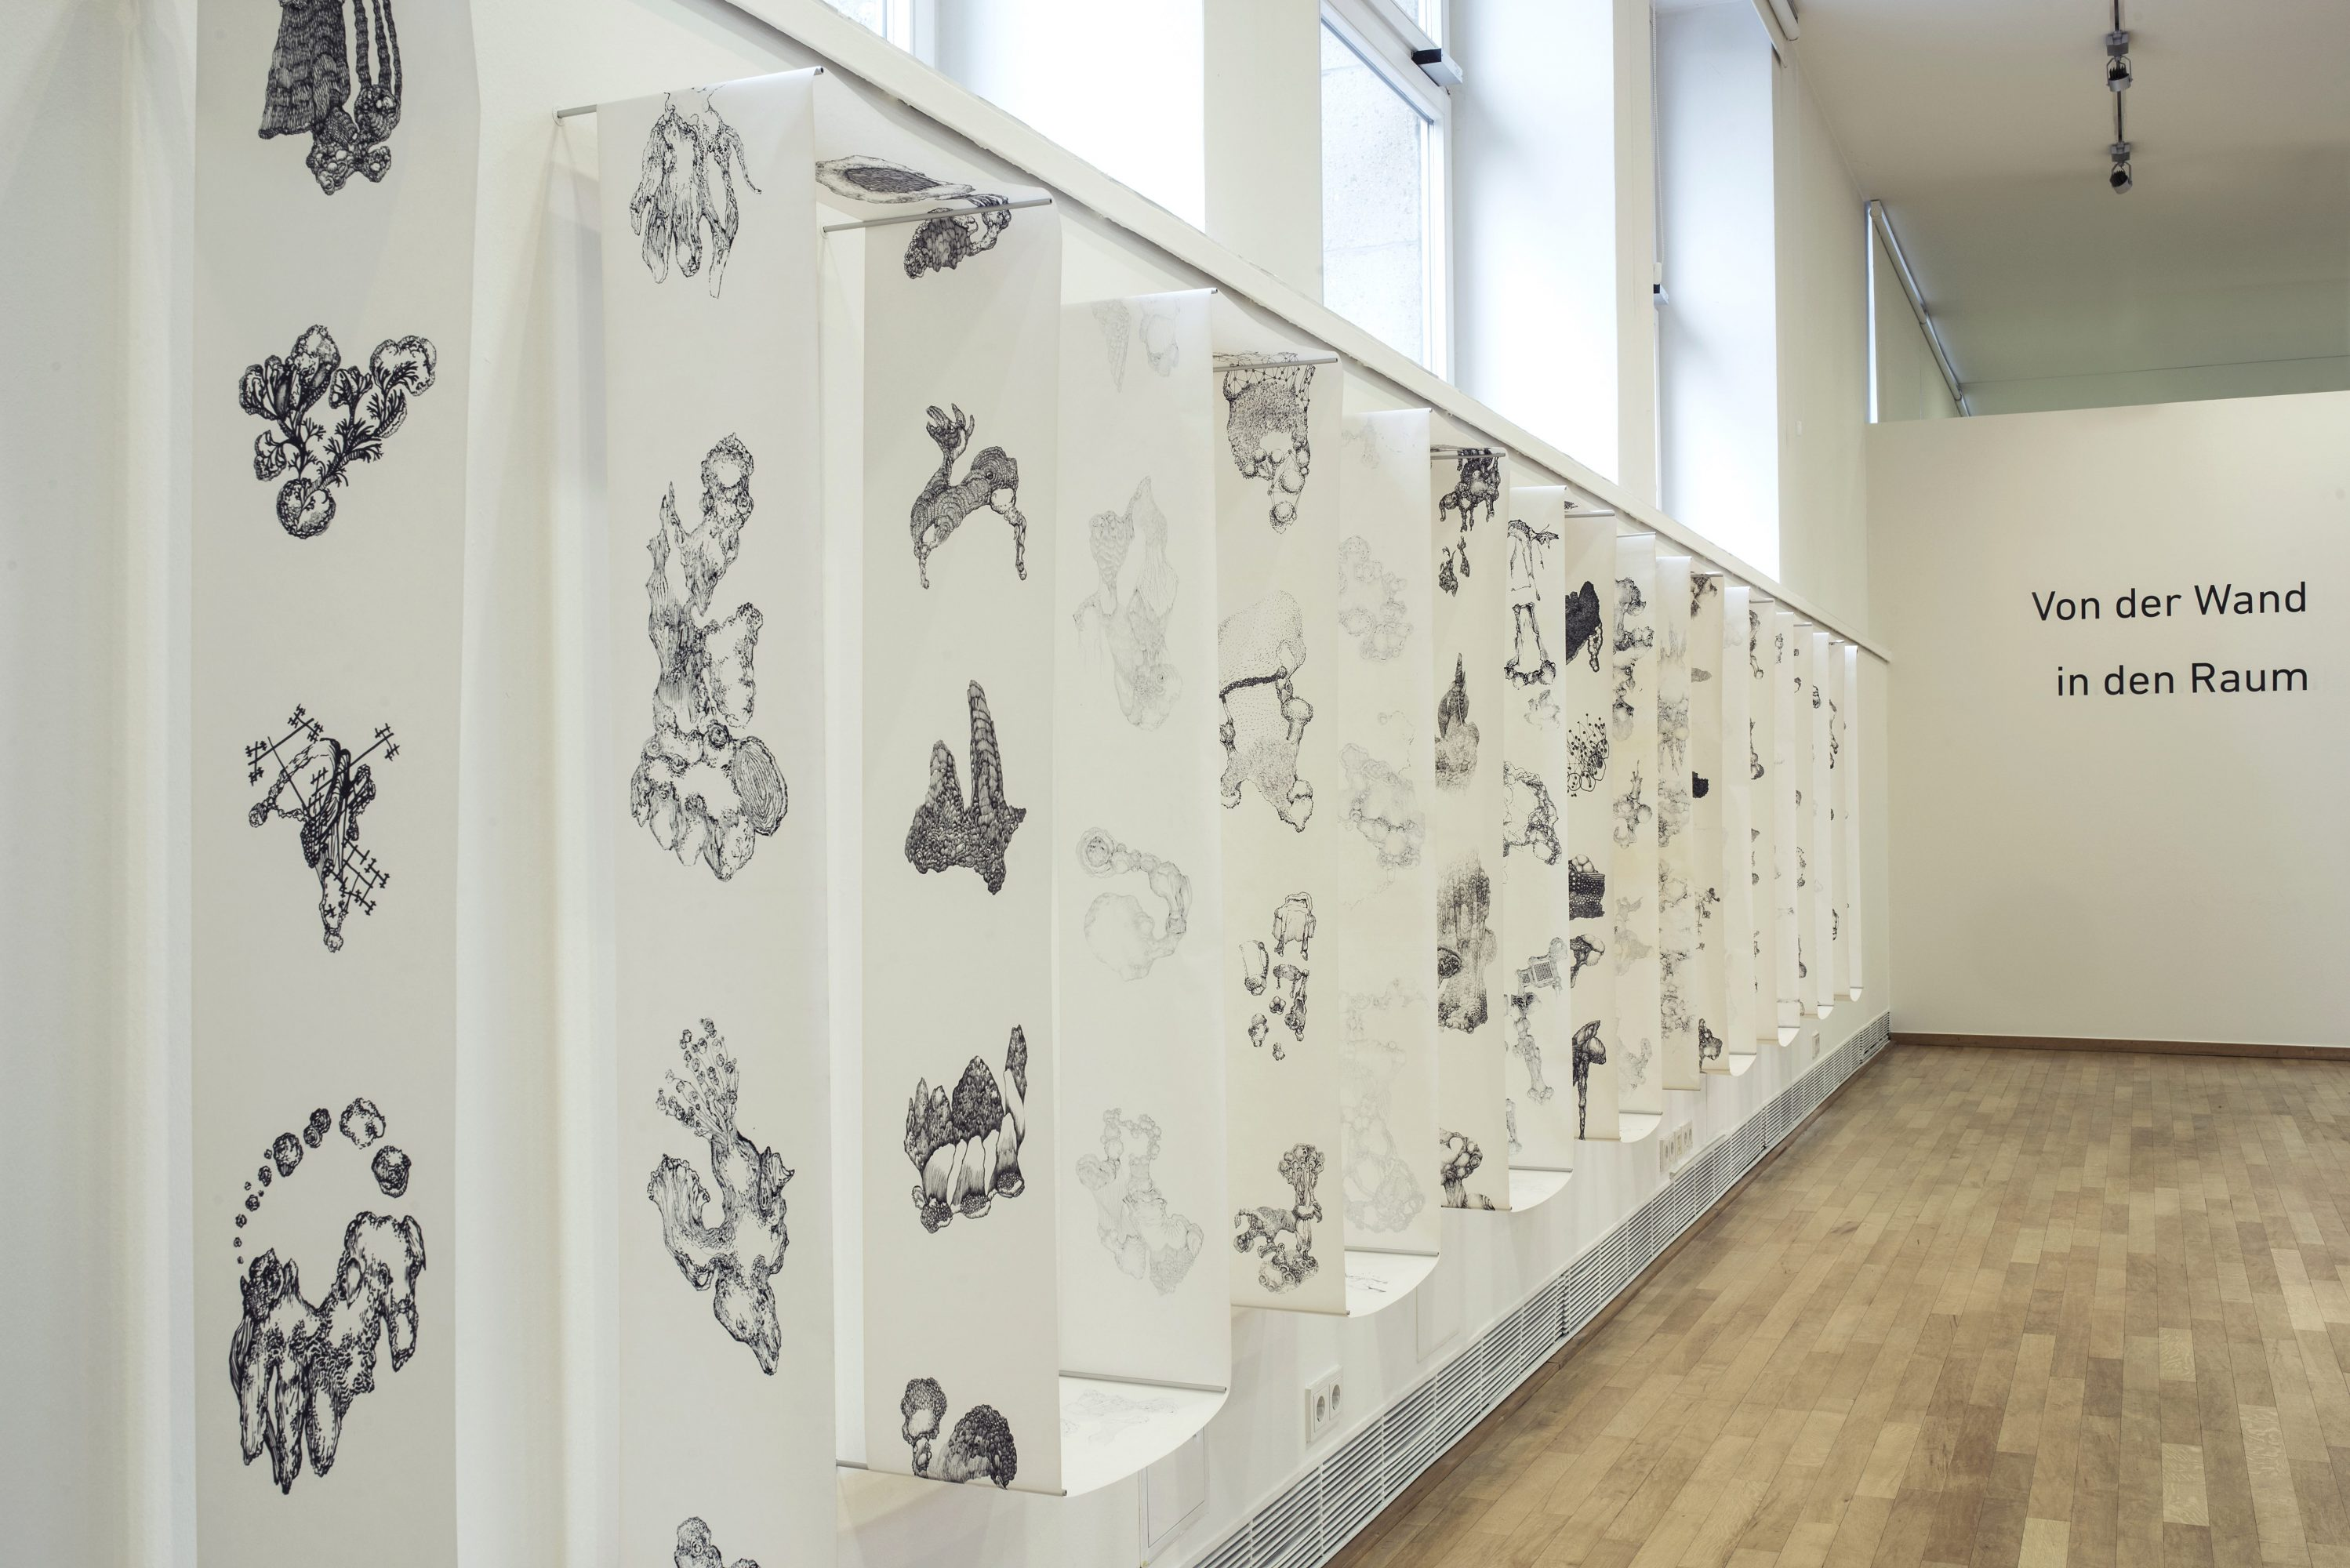 Viktoria Strecker, Ausstellungsansicht, Museumsatelier, Museum Kunstpalast, Düsseldorf, 2018. Foto: Felix Contzen